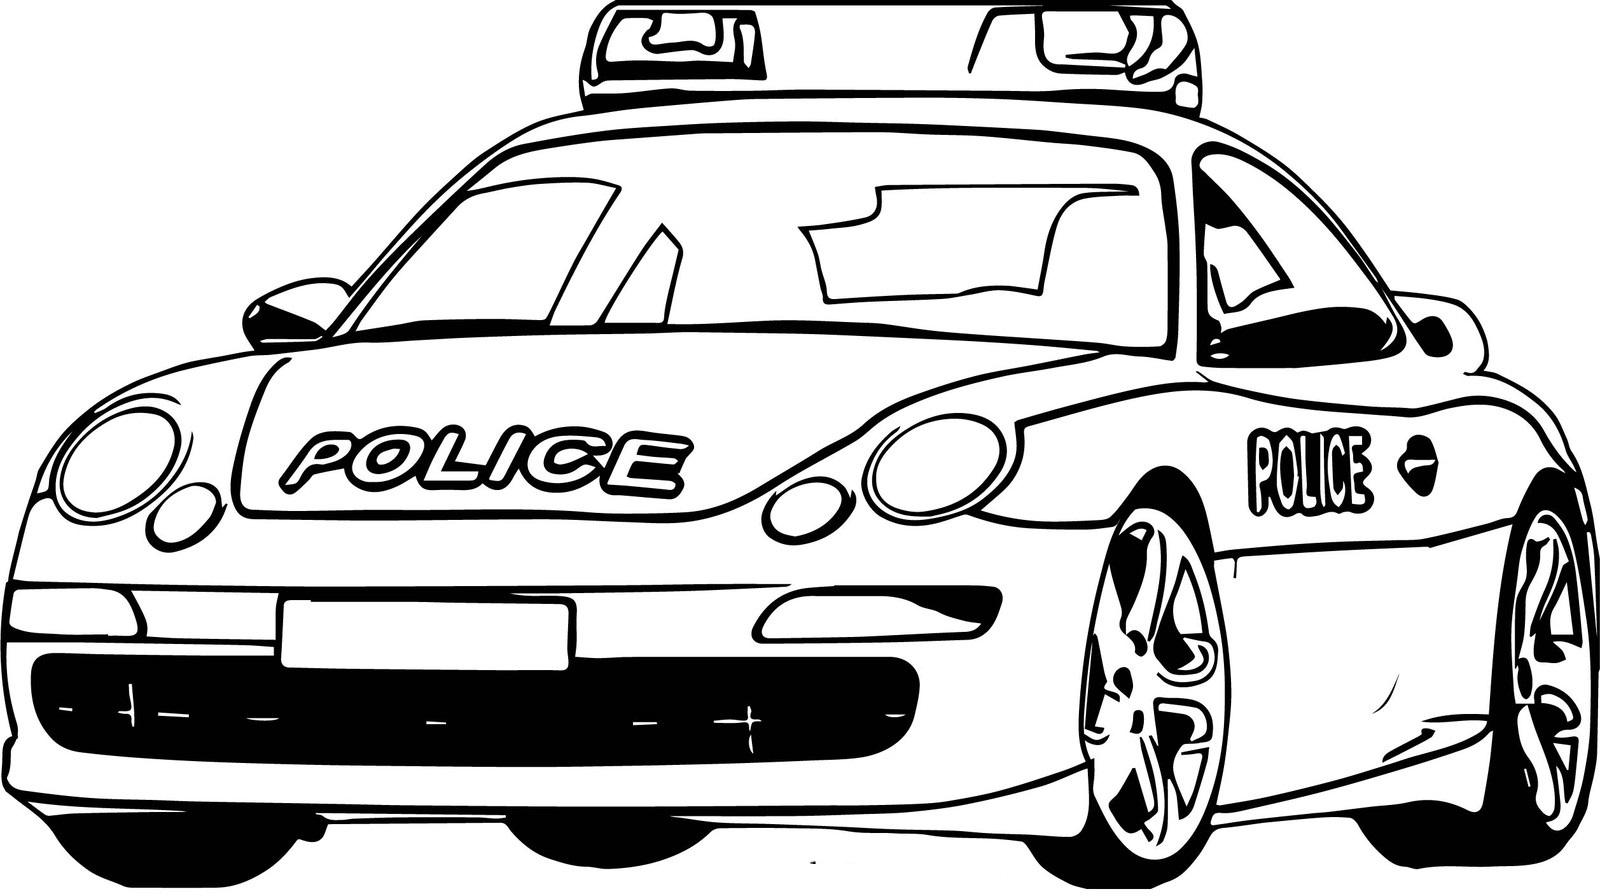 Polizeiauto Ausmalbild - Playmobil 30 Ausmalbilder Kostenlos